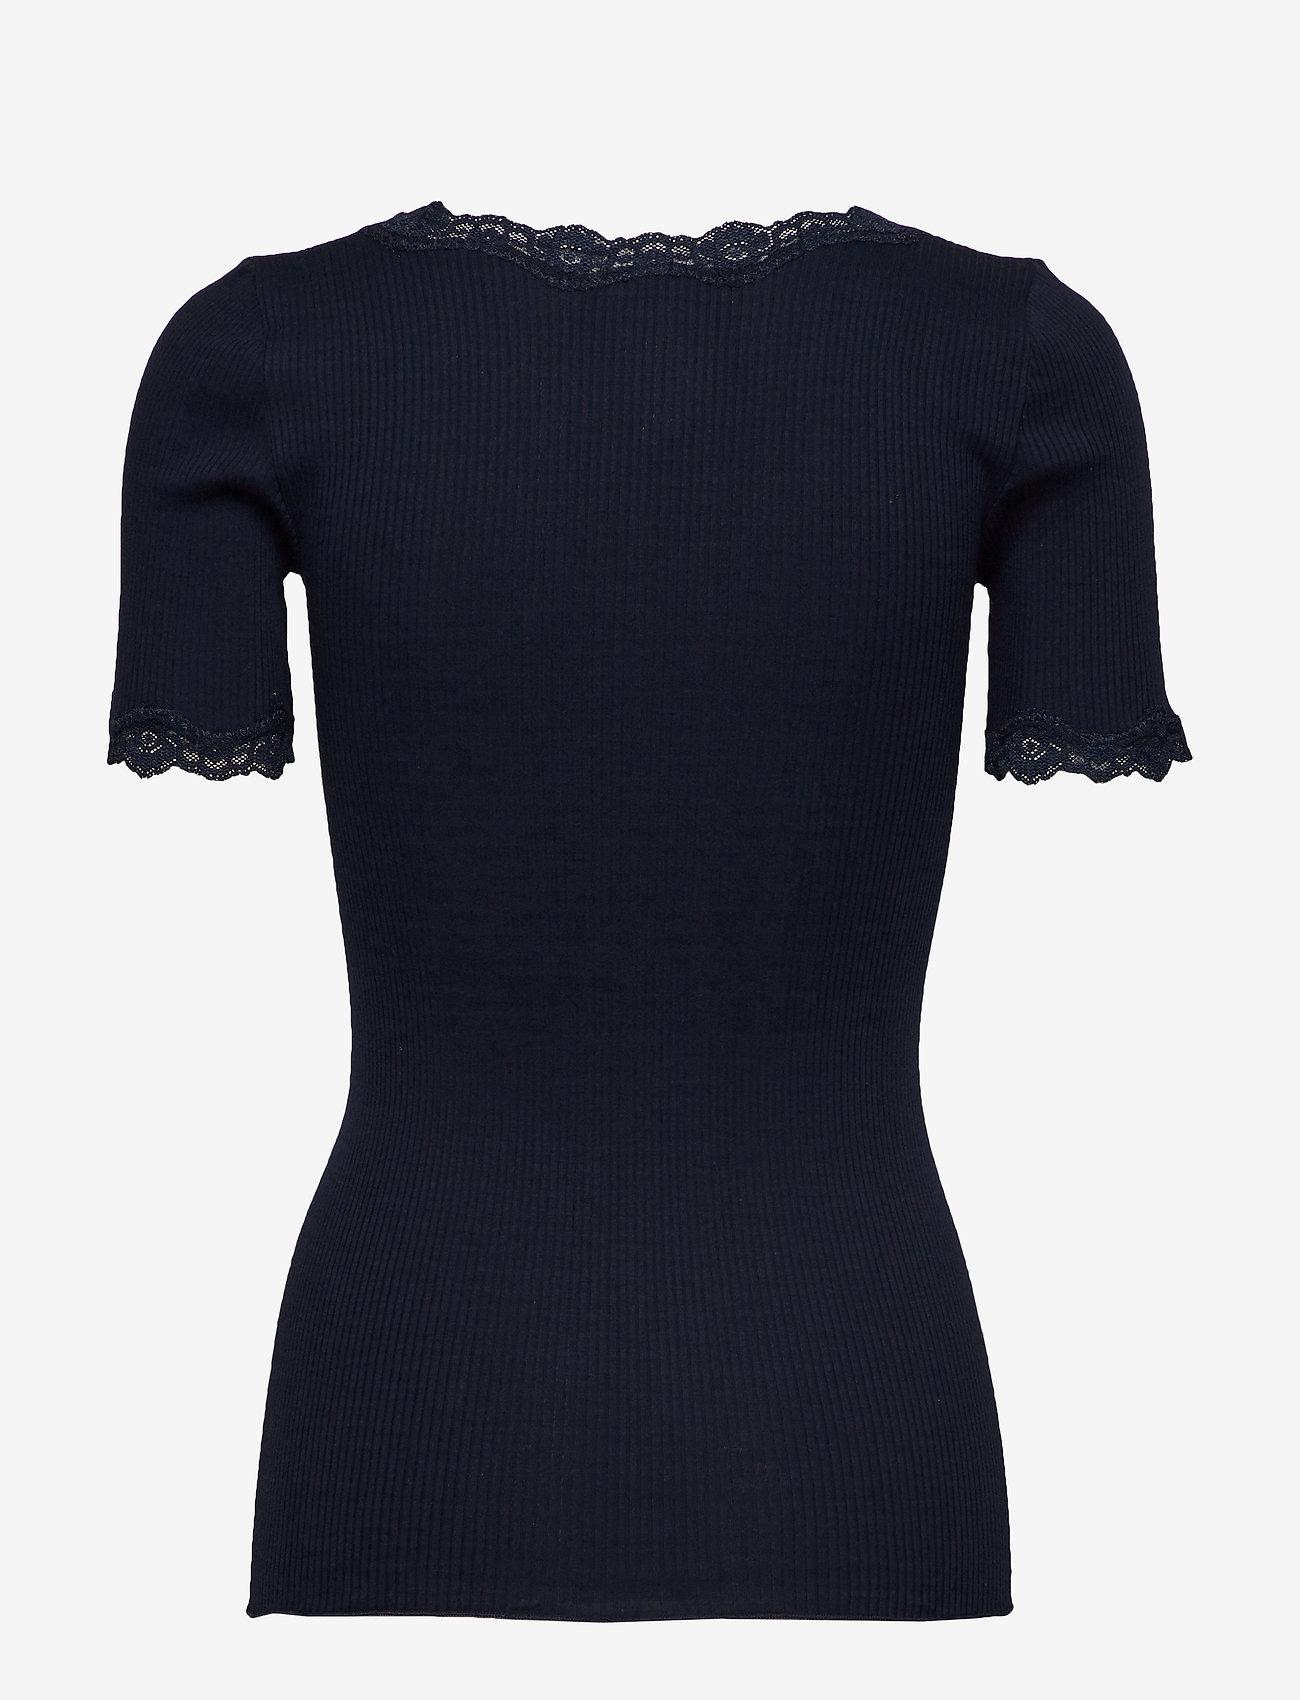 Rosemunde - Organic t-shirt regular ss w/ rev,v - t-shirts - navy - 1